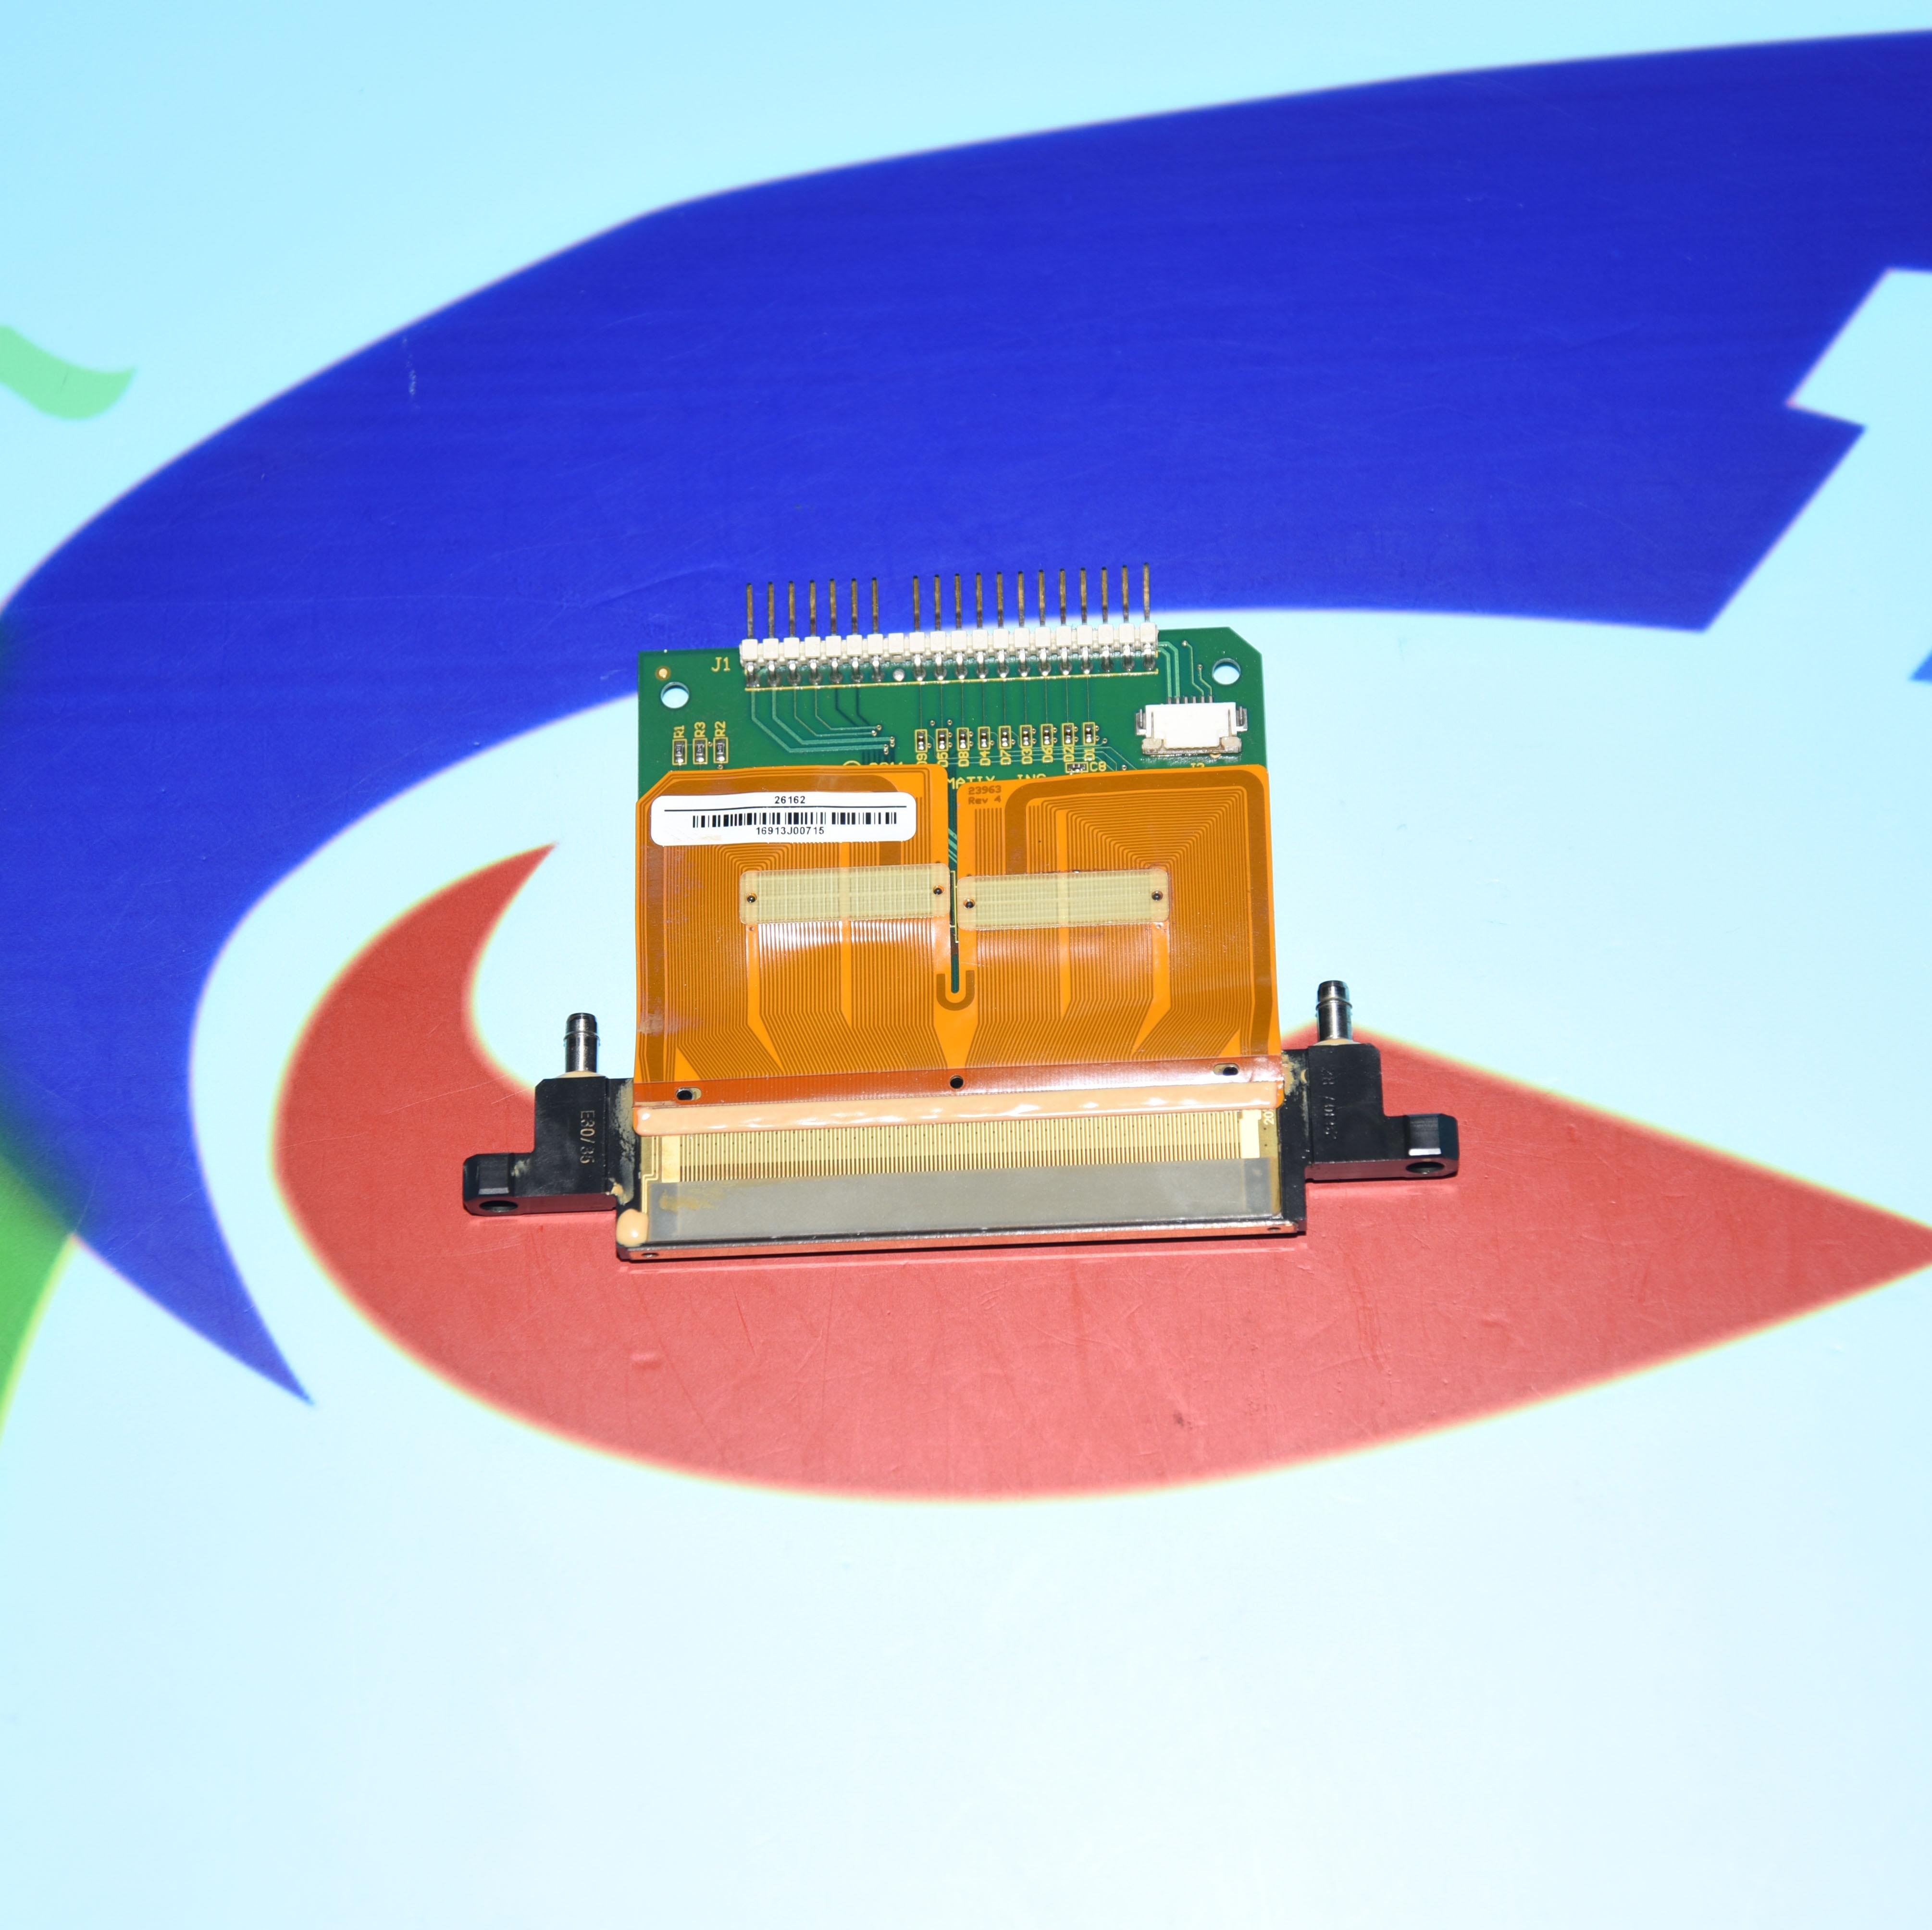 1pc refurbished printer head compatible for Spectra Polaris PQ35 512 35pl engineer inkjet printer print head